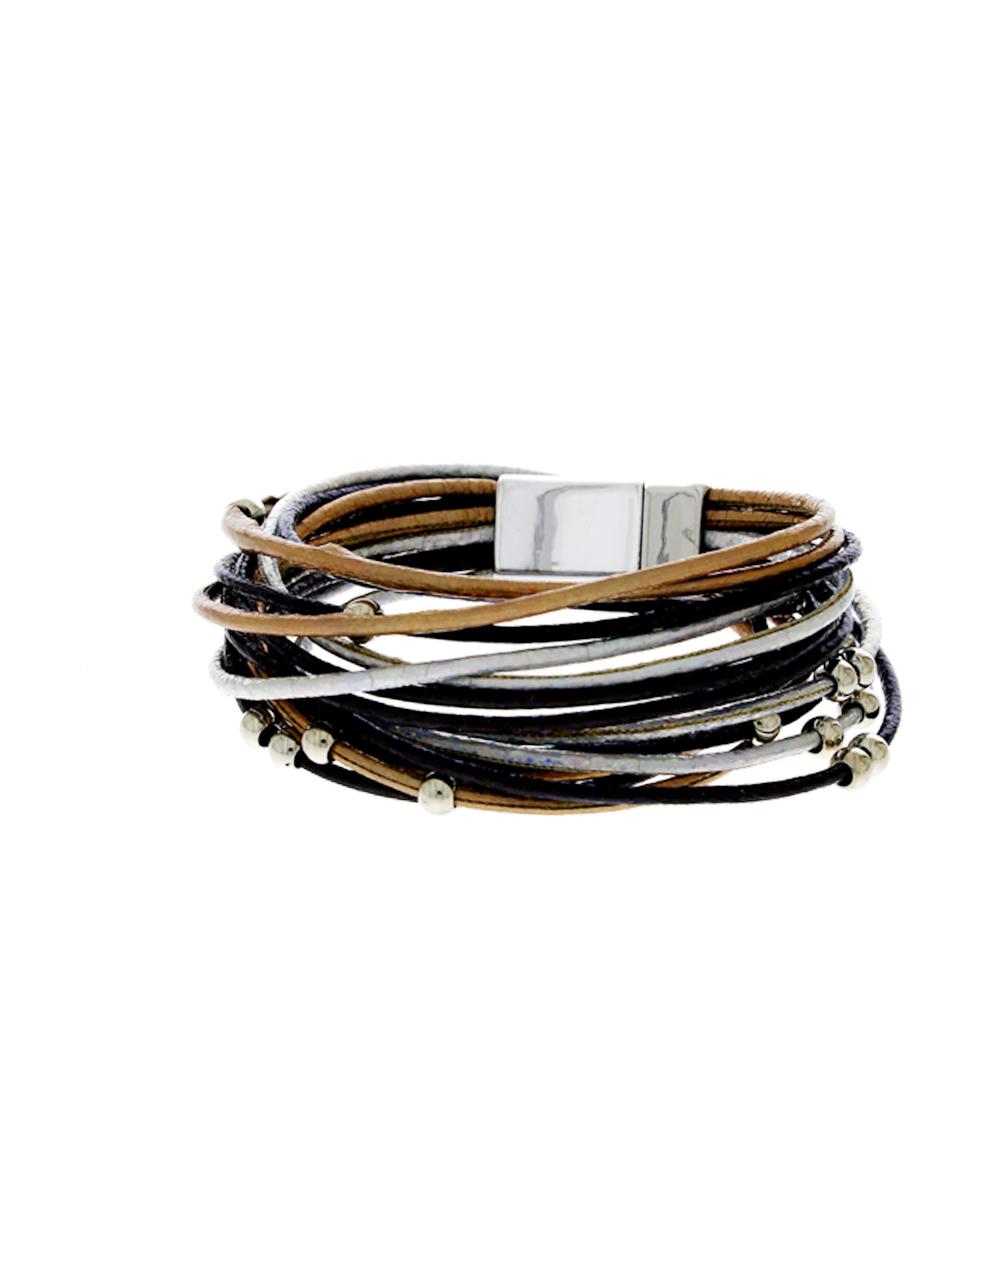 Fashionable Bracelets for Girls